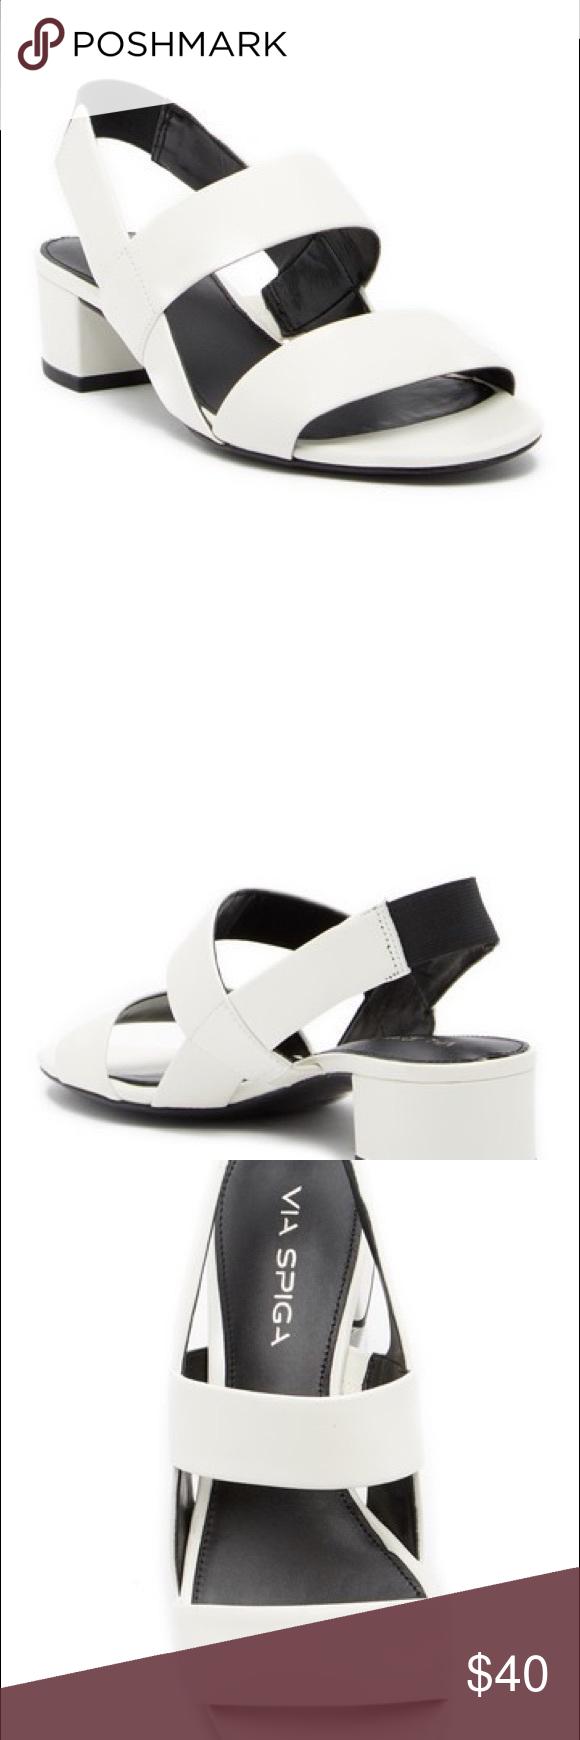 a4d1962b7a Via Spiga Block Heel Sandal Via Spiga Tiana Leather Slingback Block Heel  Sandal True to size.Open toe - Leather construction - Dual vamp straps -  Hidden ...